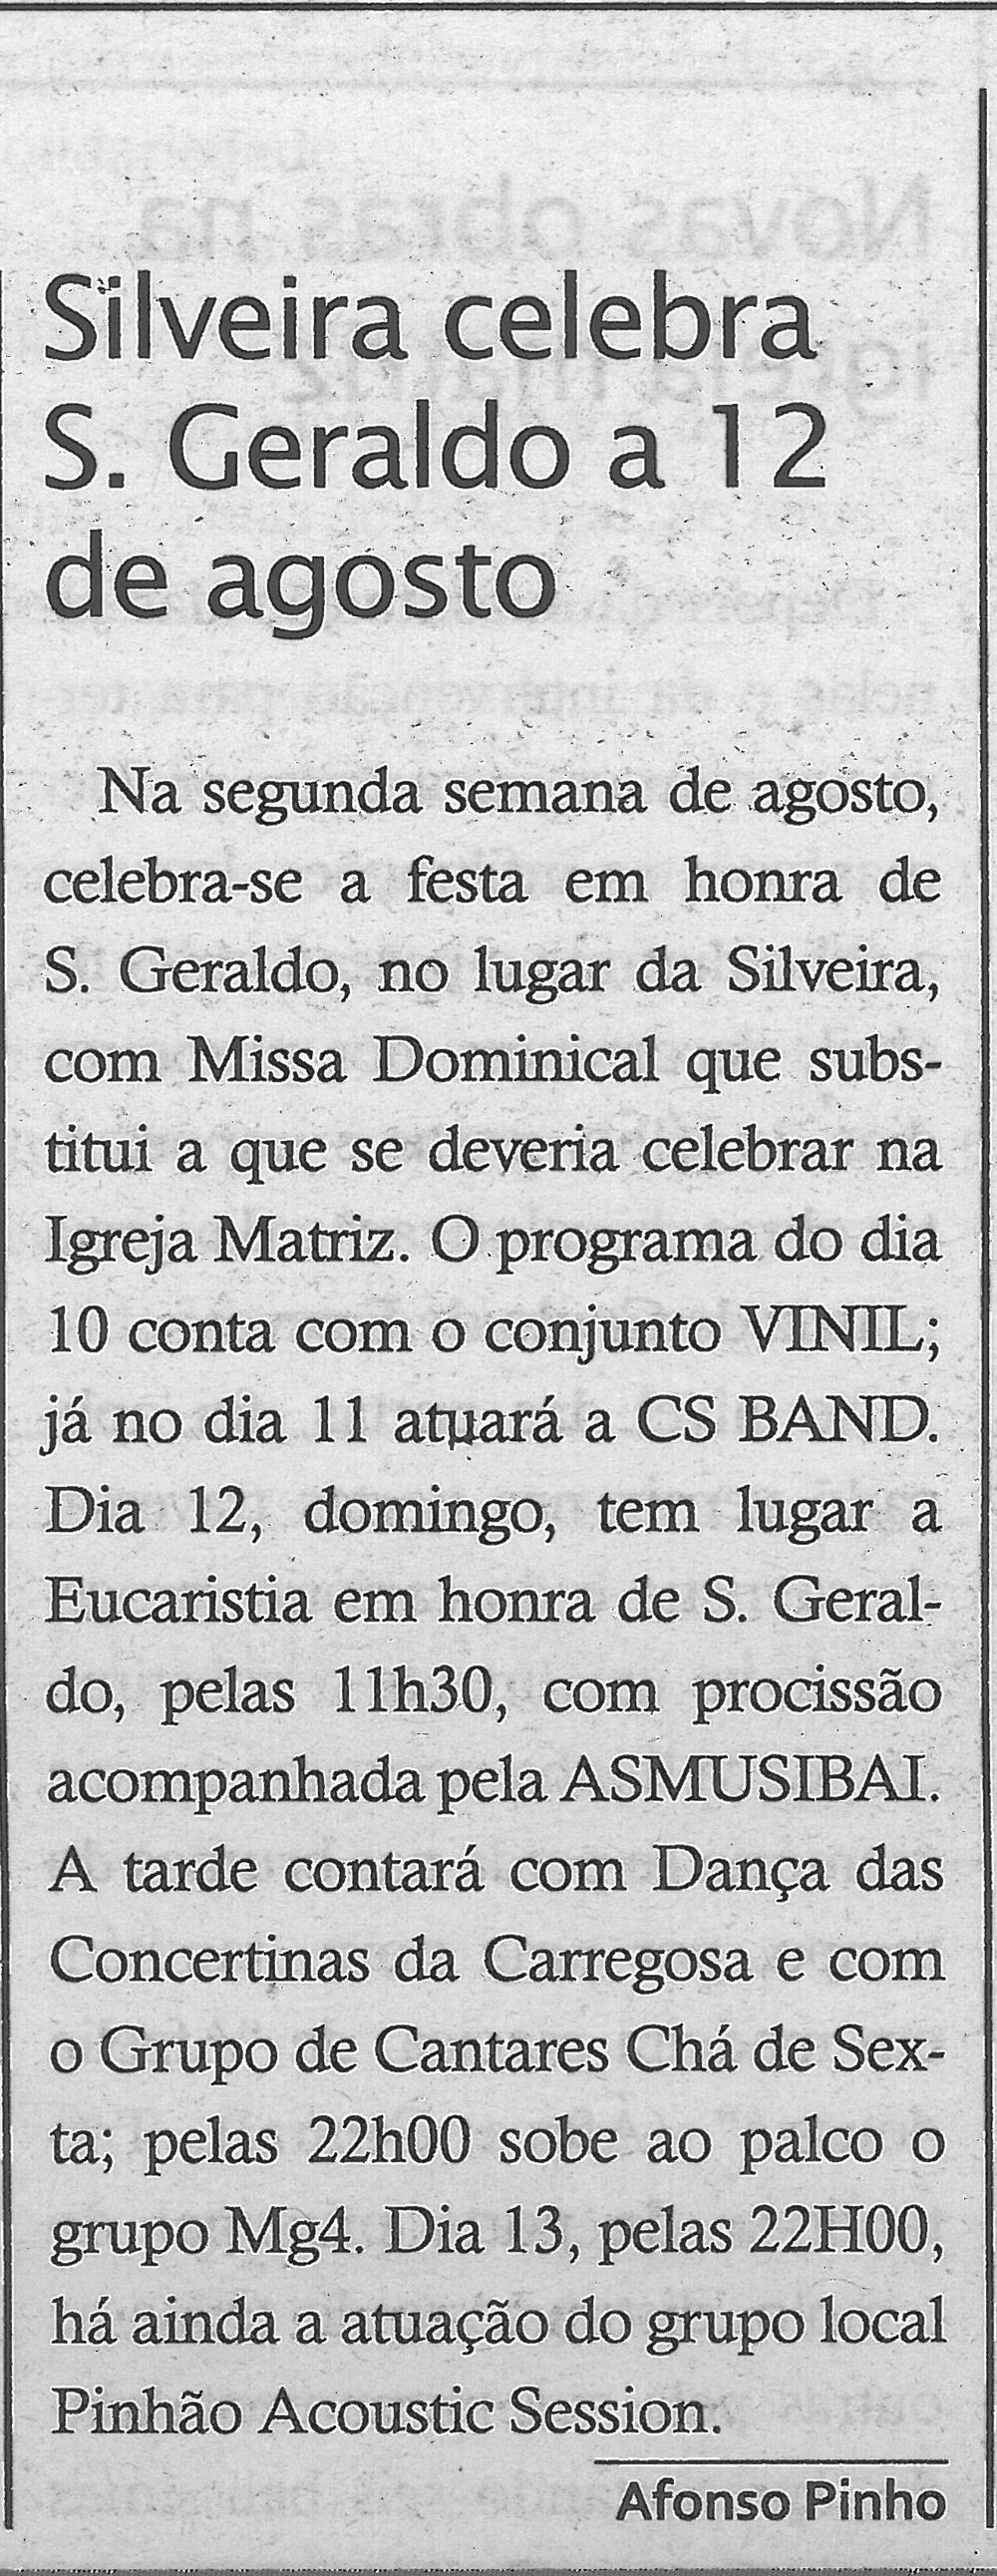 TV-ago.'18-p.13-Silveira celebra S. Geraldo a 12 de agosto.jpg